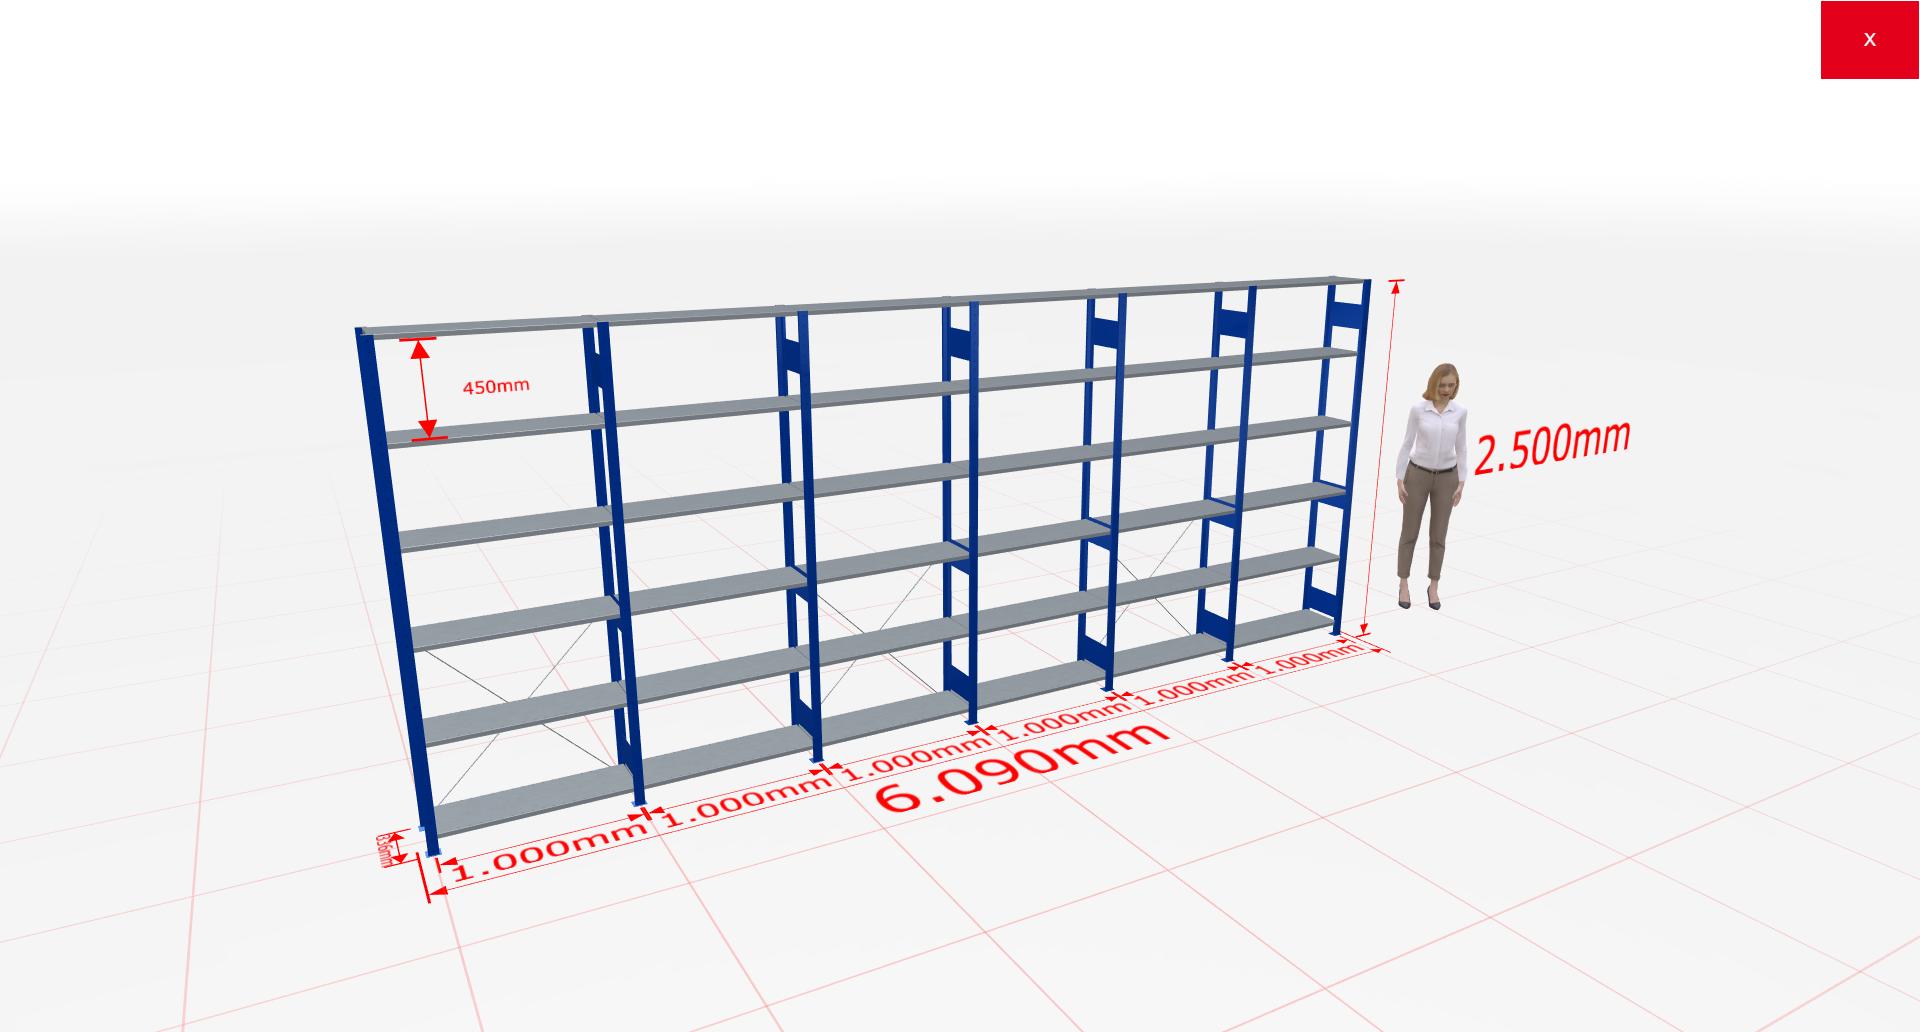 Fachbodenregal Komplettregal 2500x6090x300 mm (HxBxT) SCHULTE Lagertechnik blau 6 Ebenen  150 kg je Boden